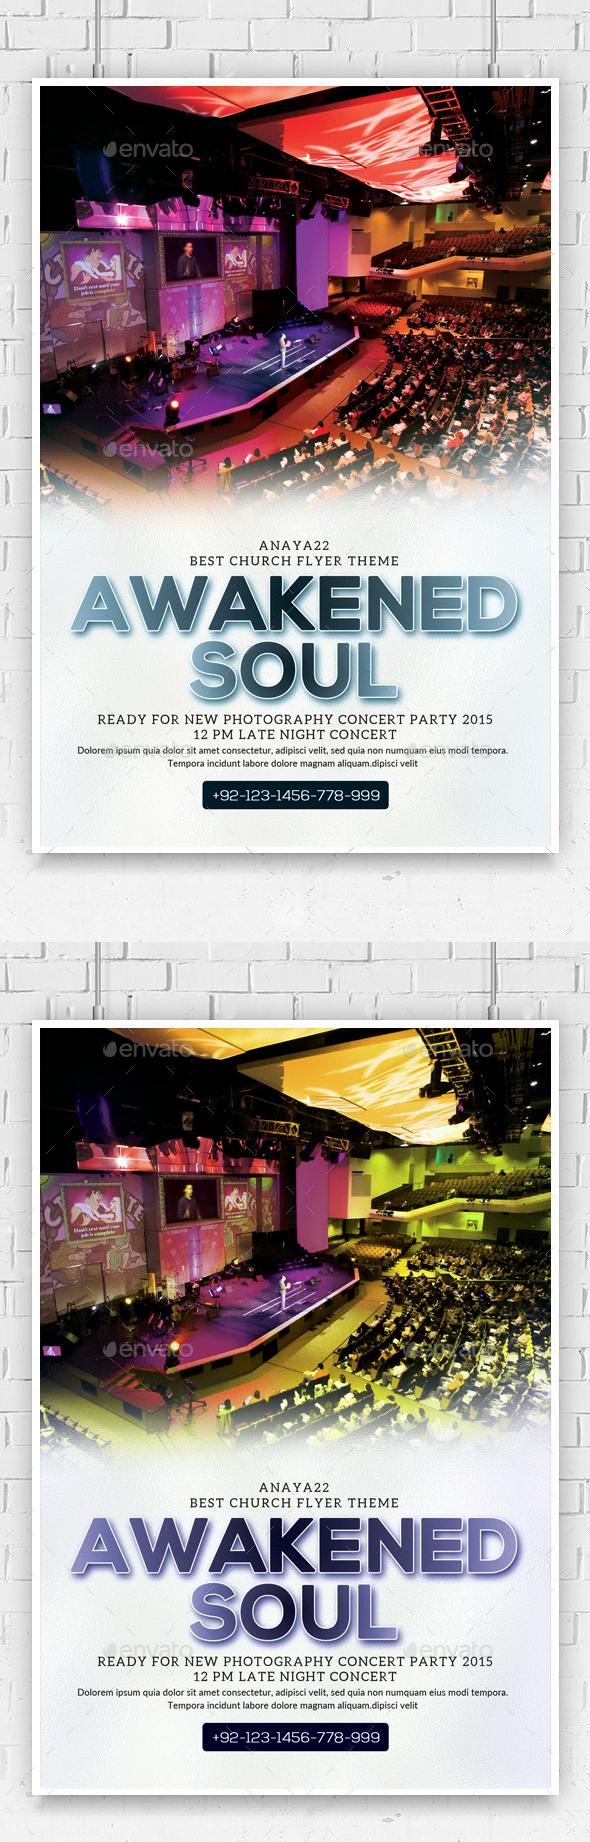 Awakened Soul Church Flyer  - Church Flyers